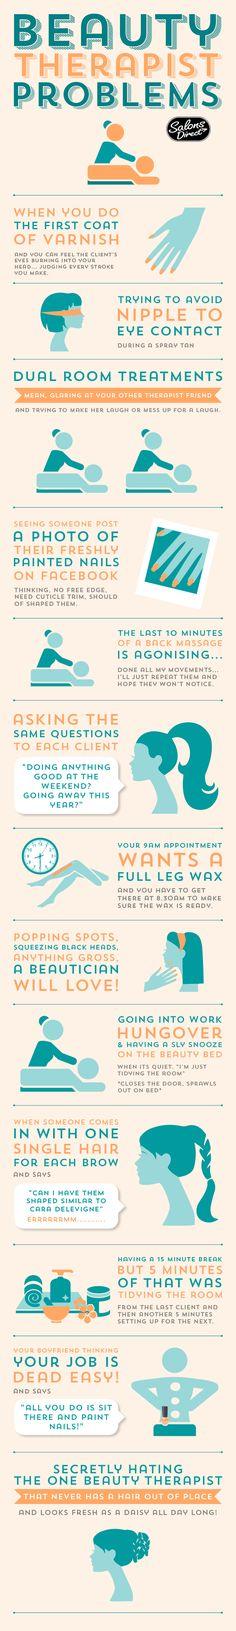 Beauty Therapist Problems #beautytherapist